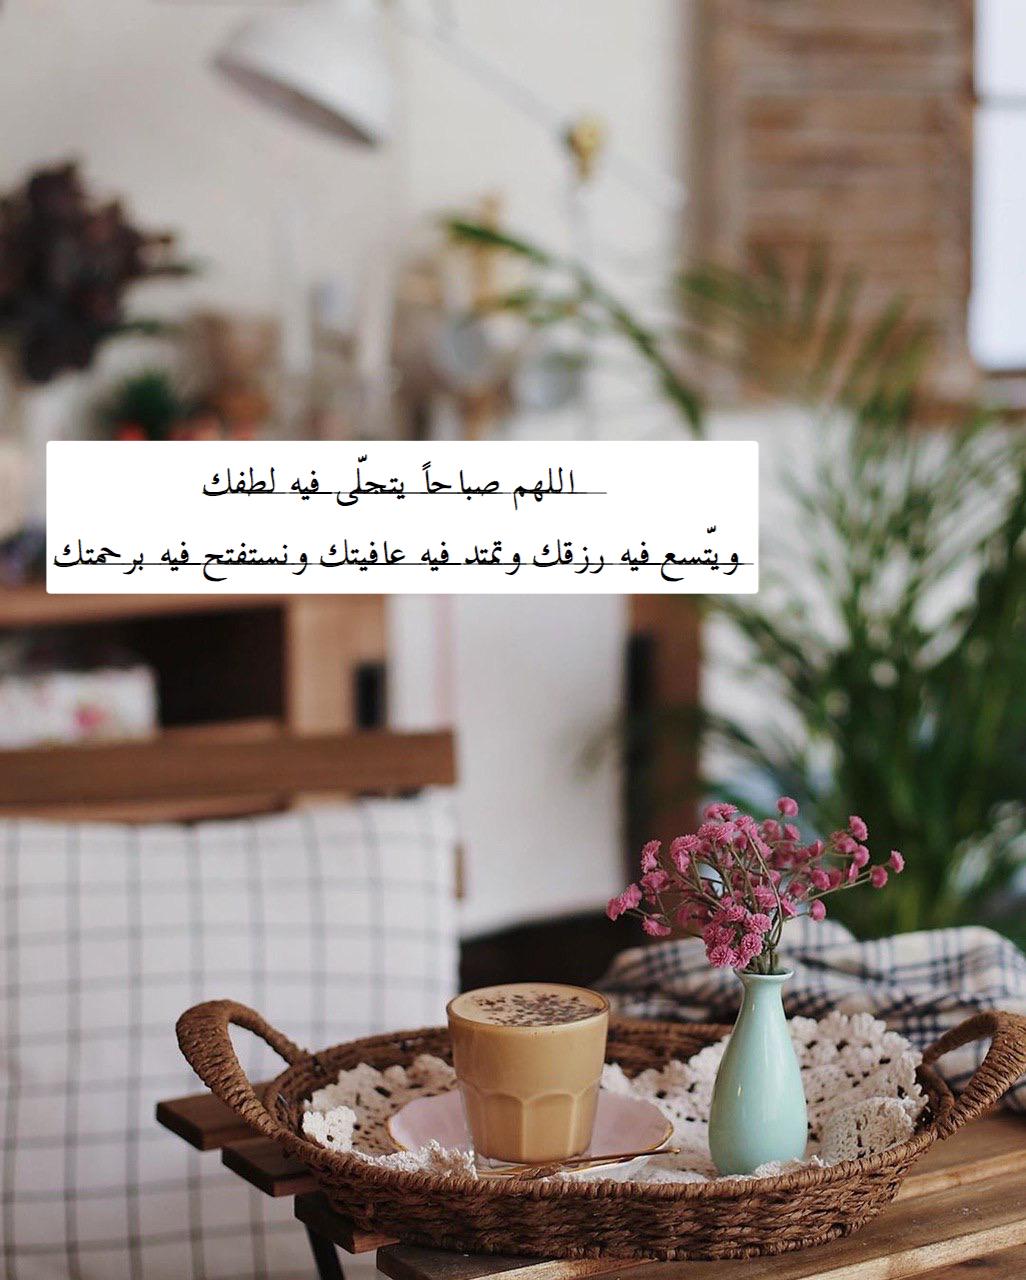 صباح الخير Coffee Quotes Place Card Holders Love Words